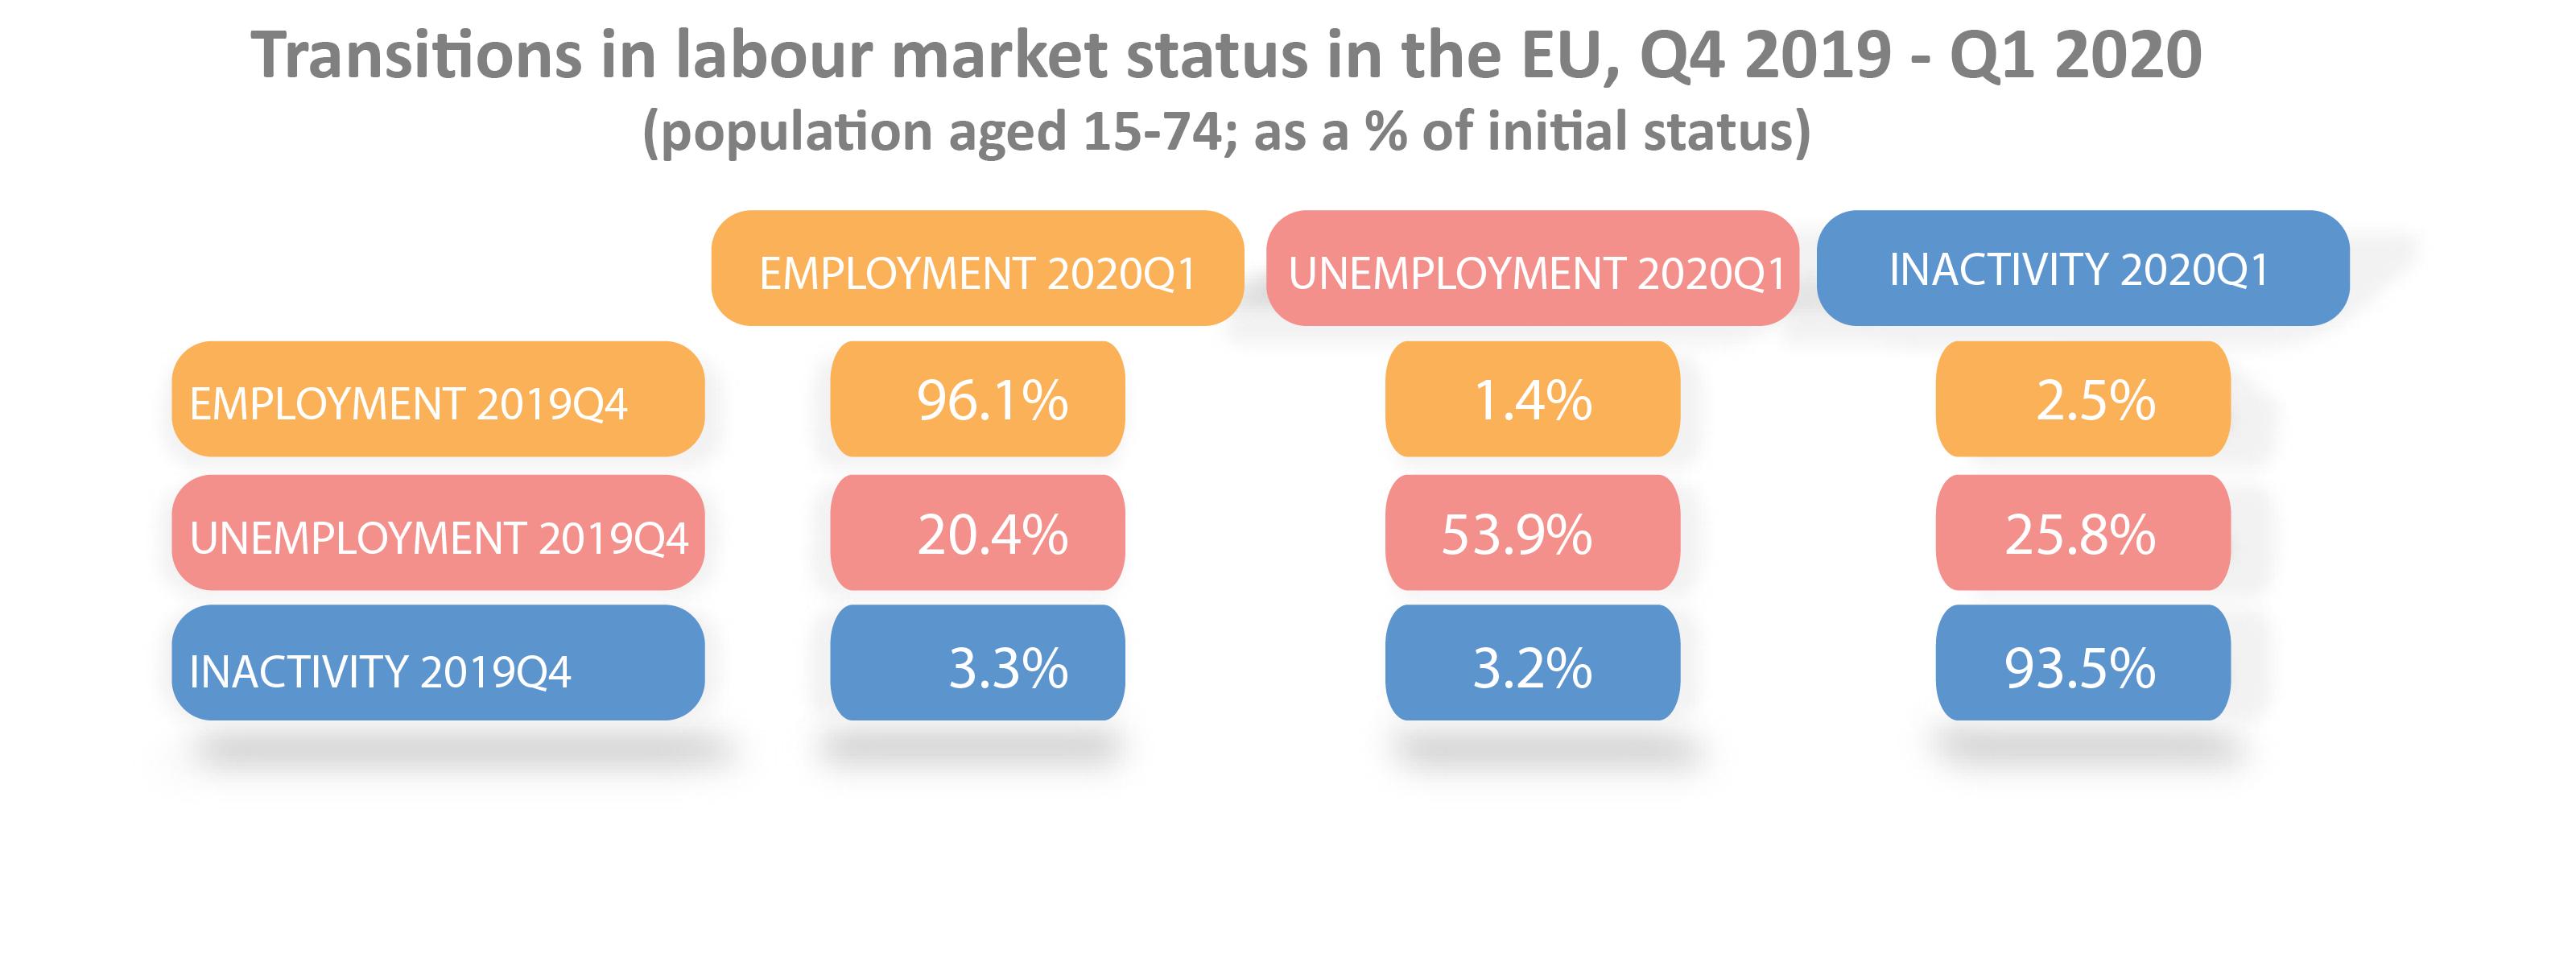 Transitions in labour market status in the EU, Q4 2019-Q1 2020